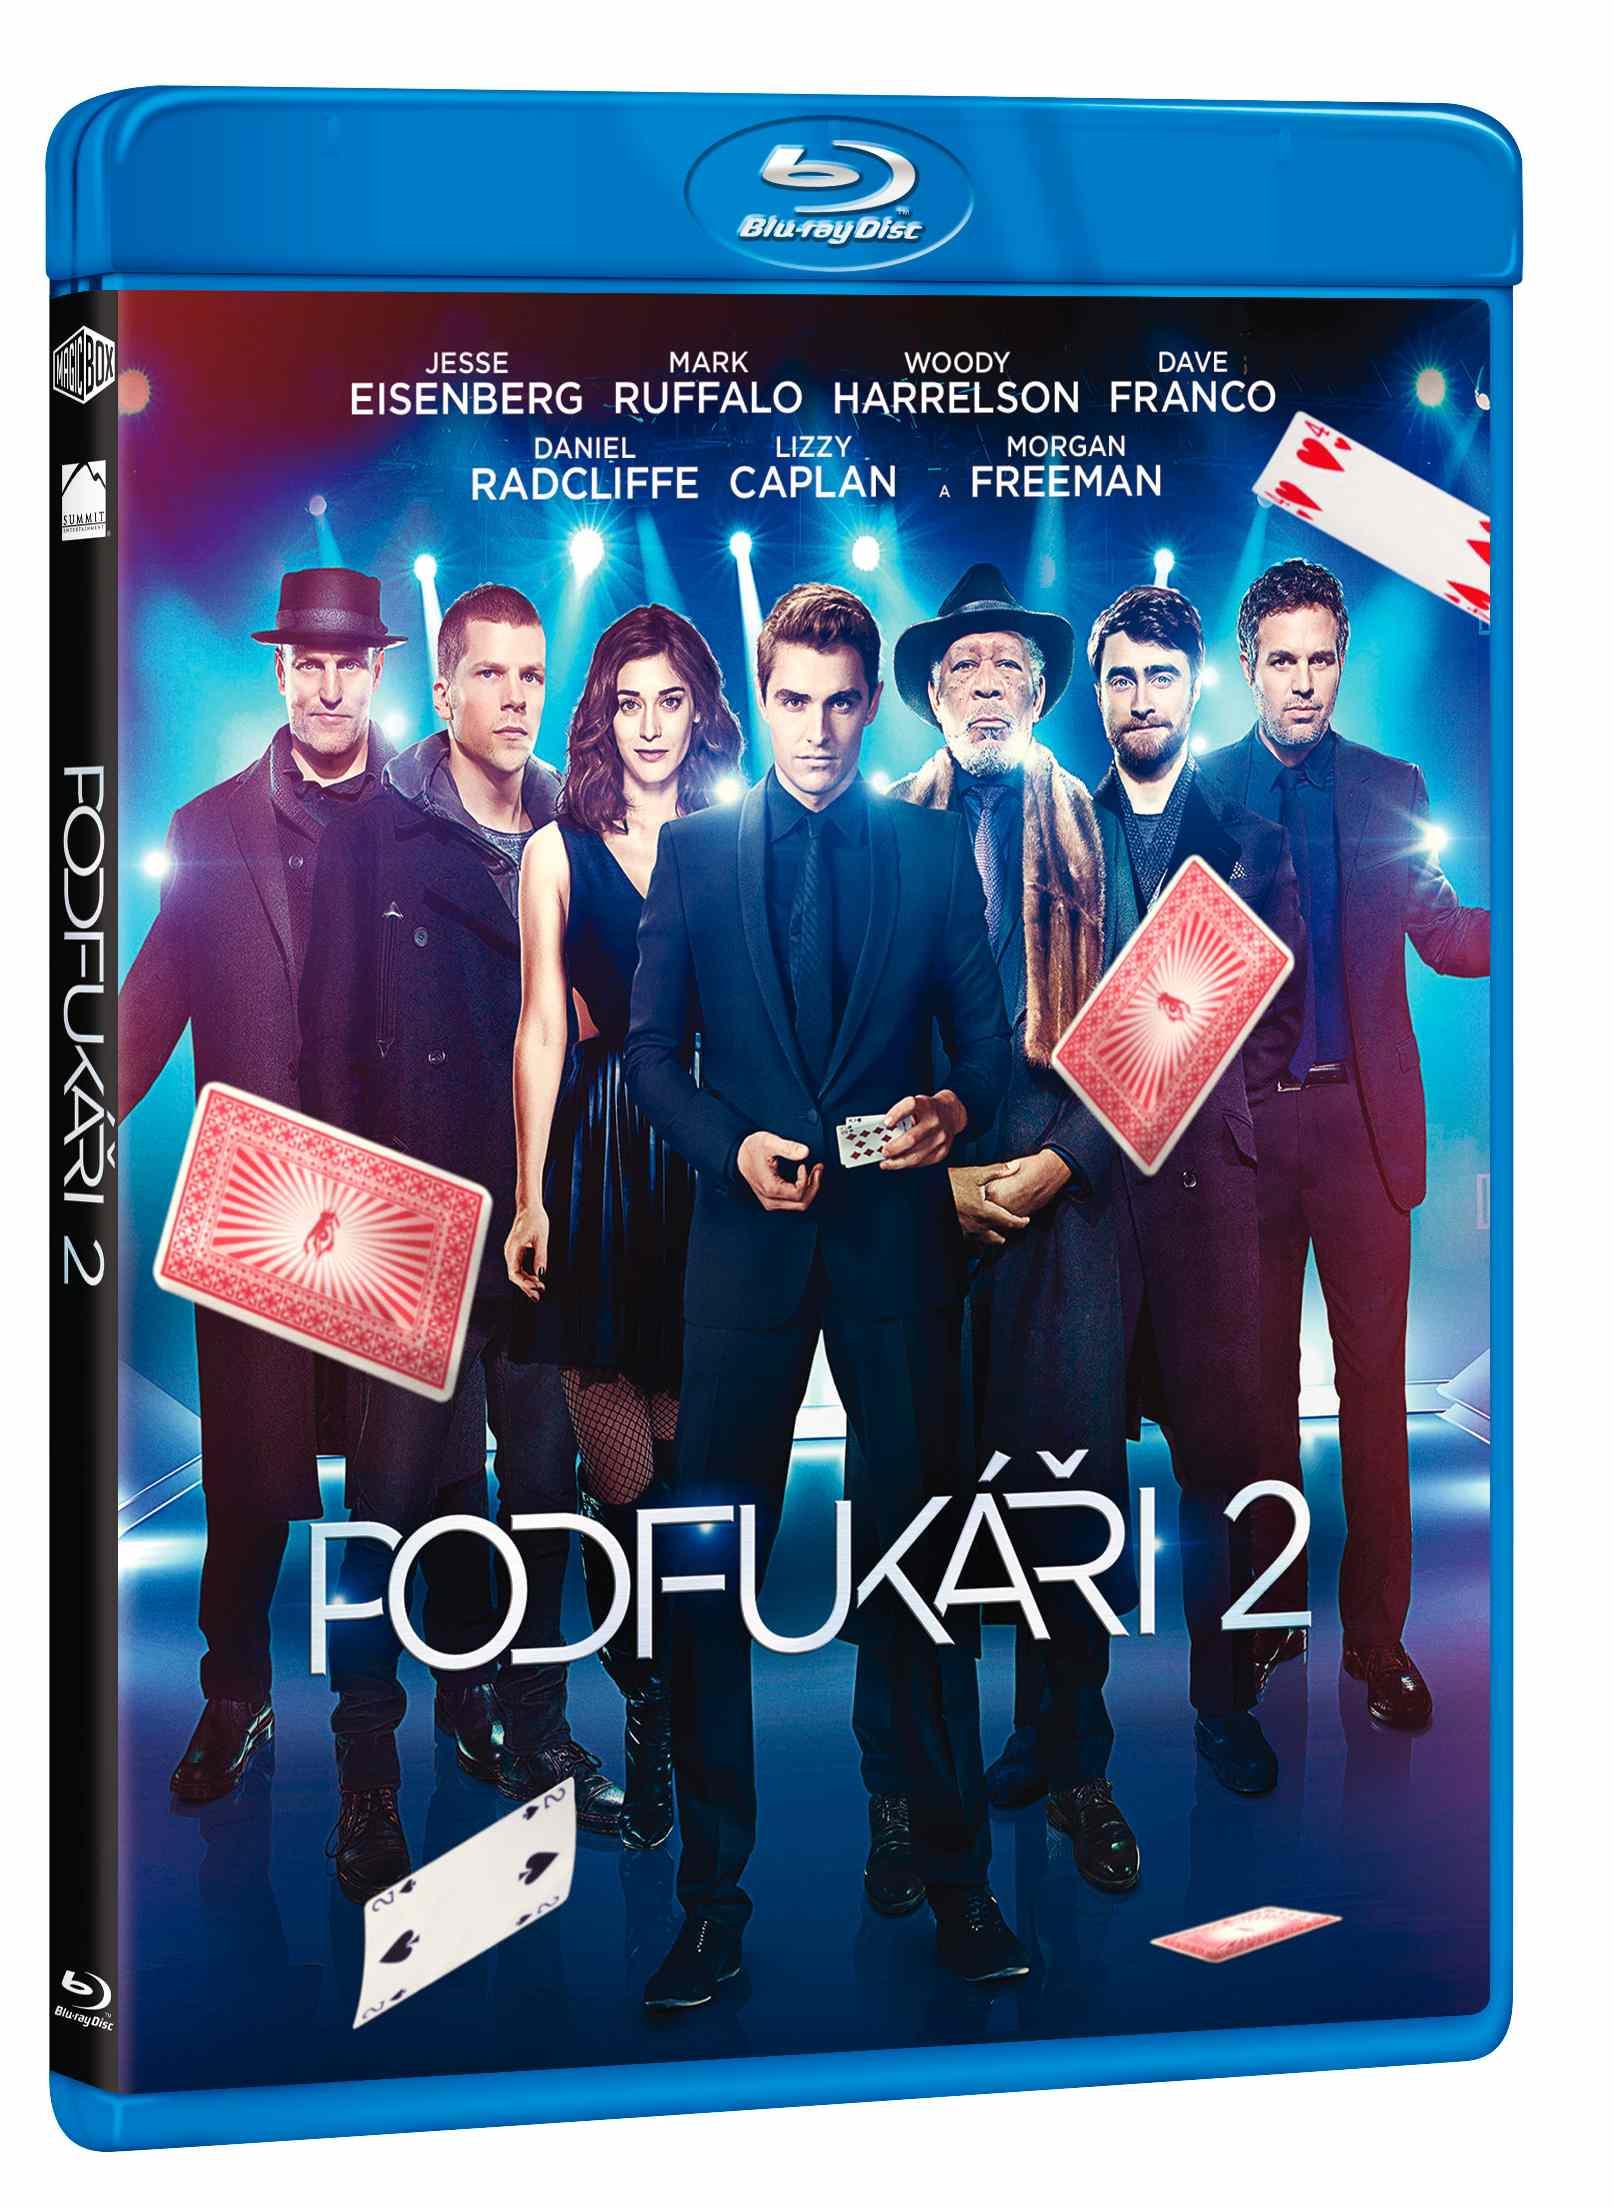 PODFUKÁŘI 2 - Blu-ray